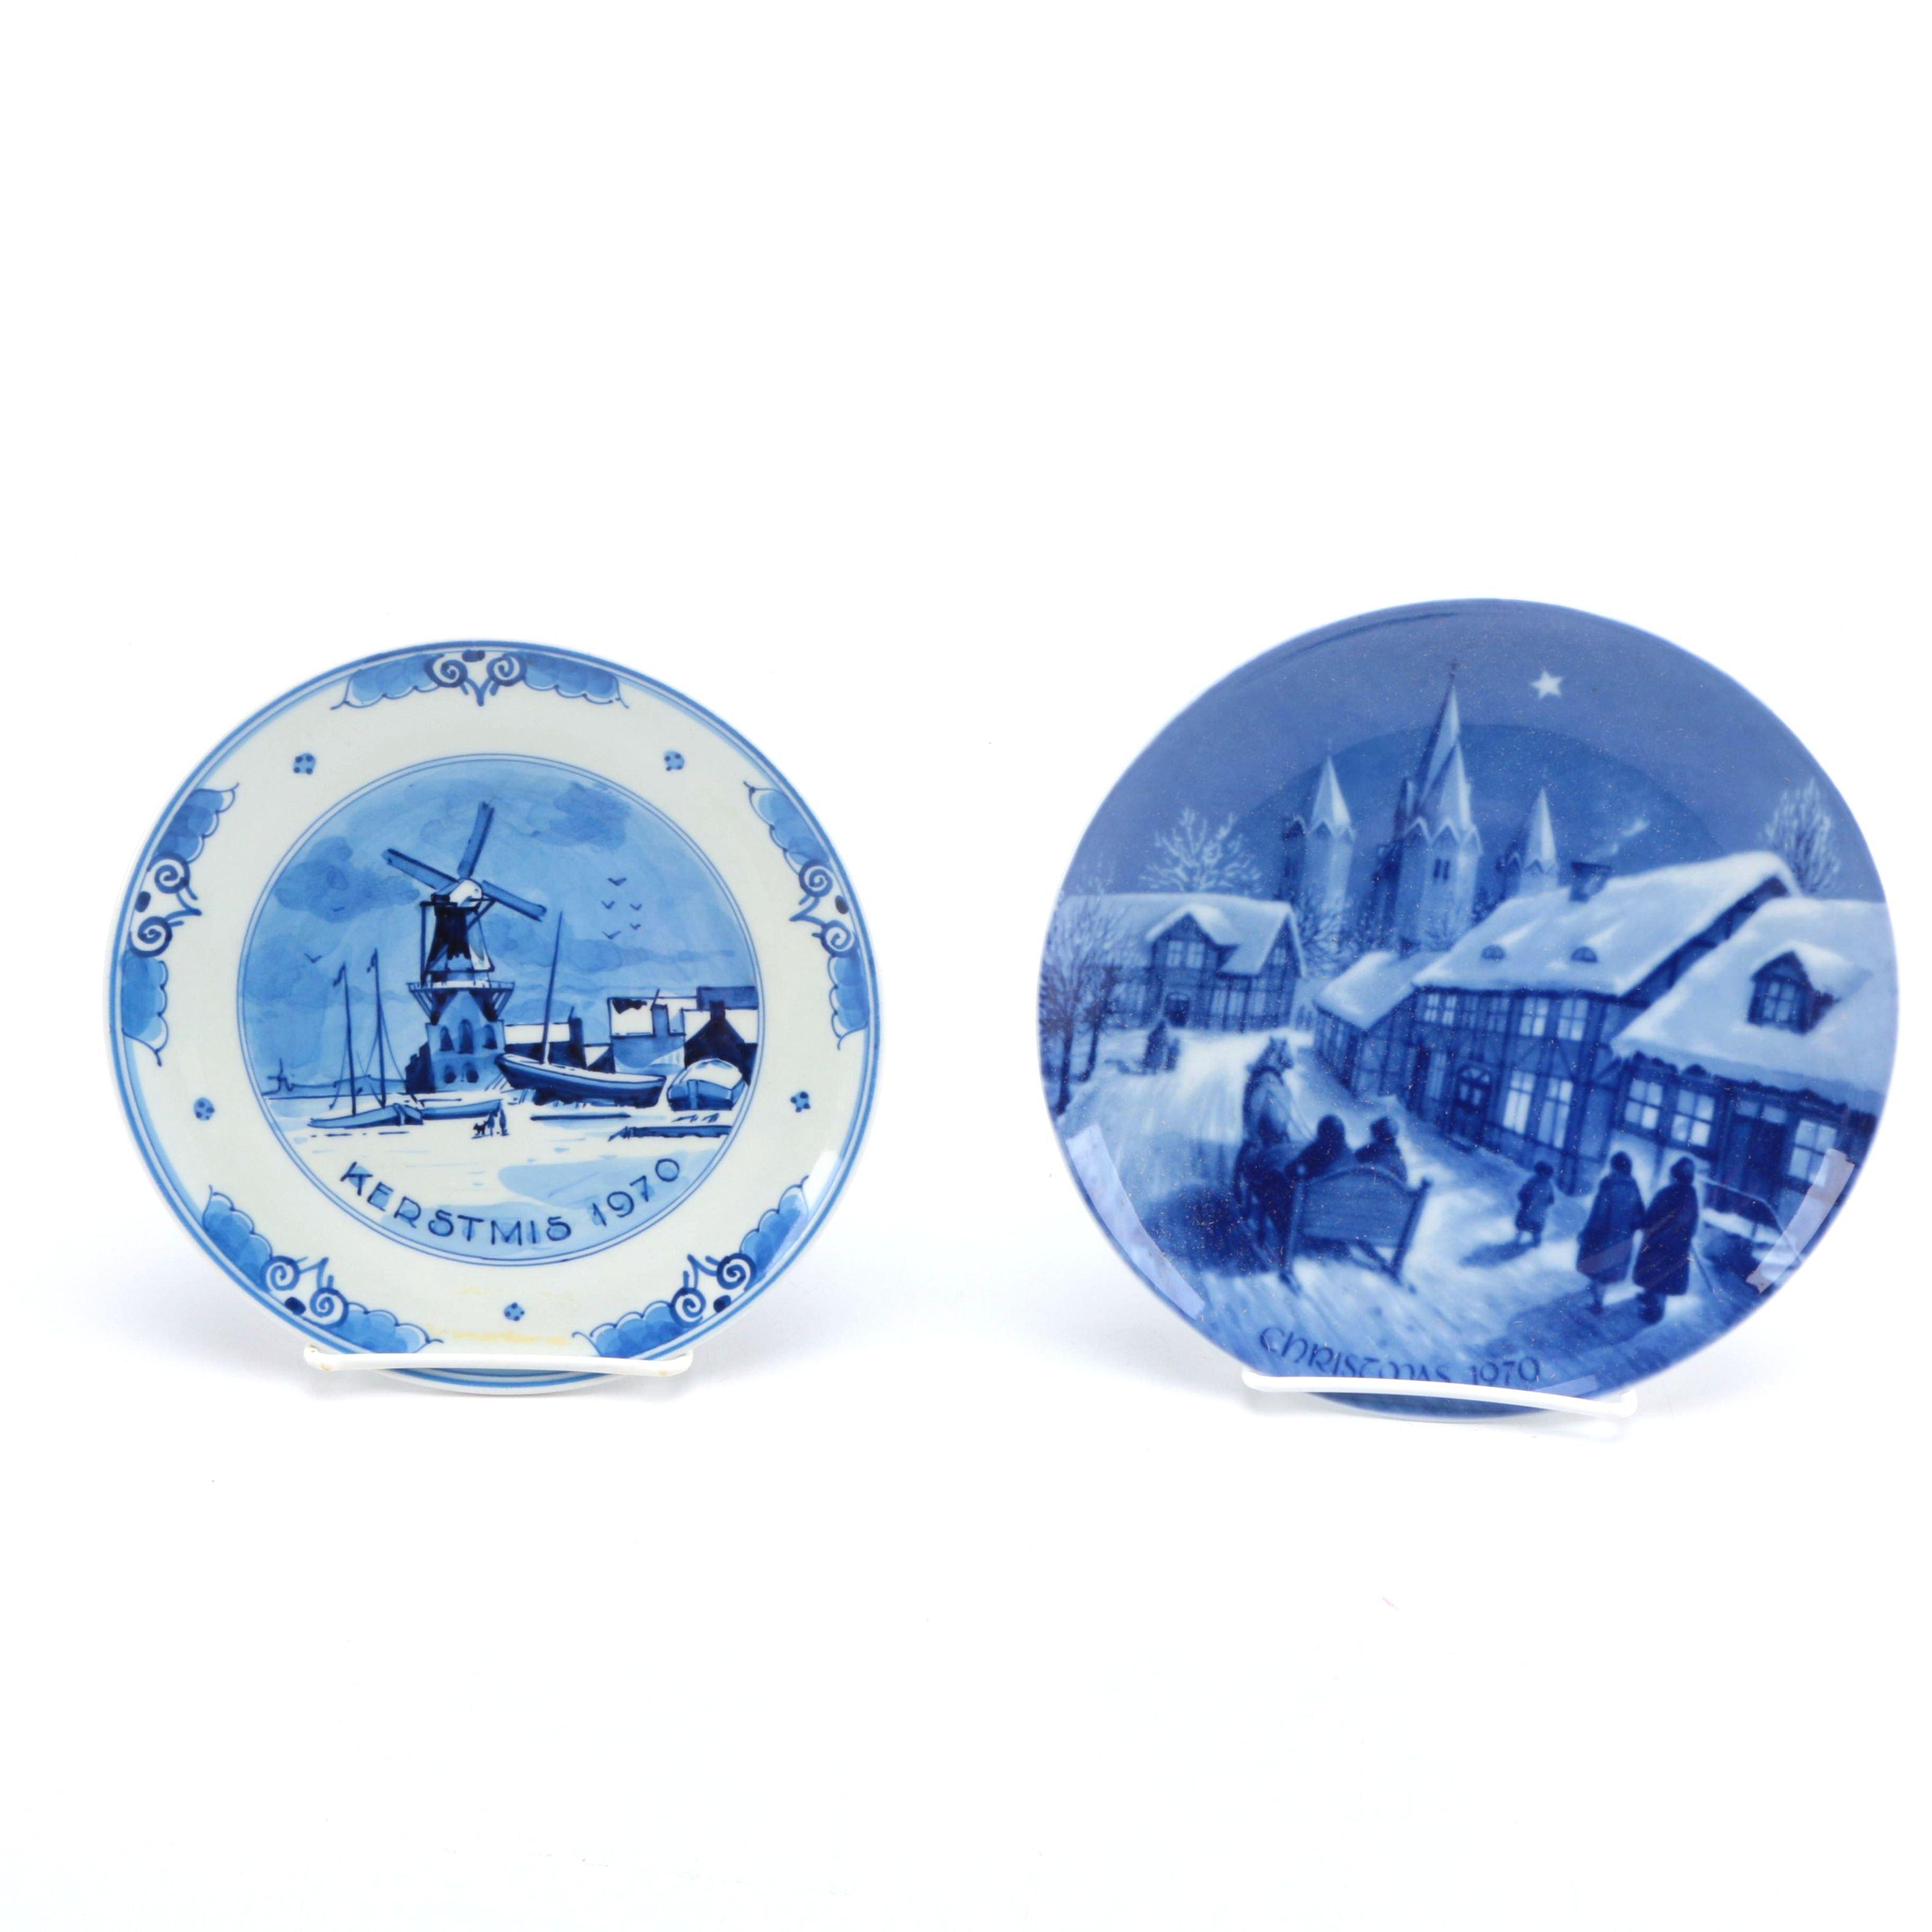 1970 Decorative Christmas Plates